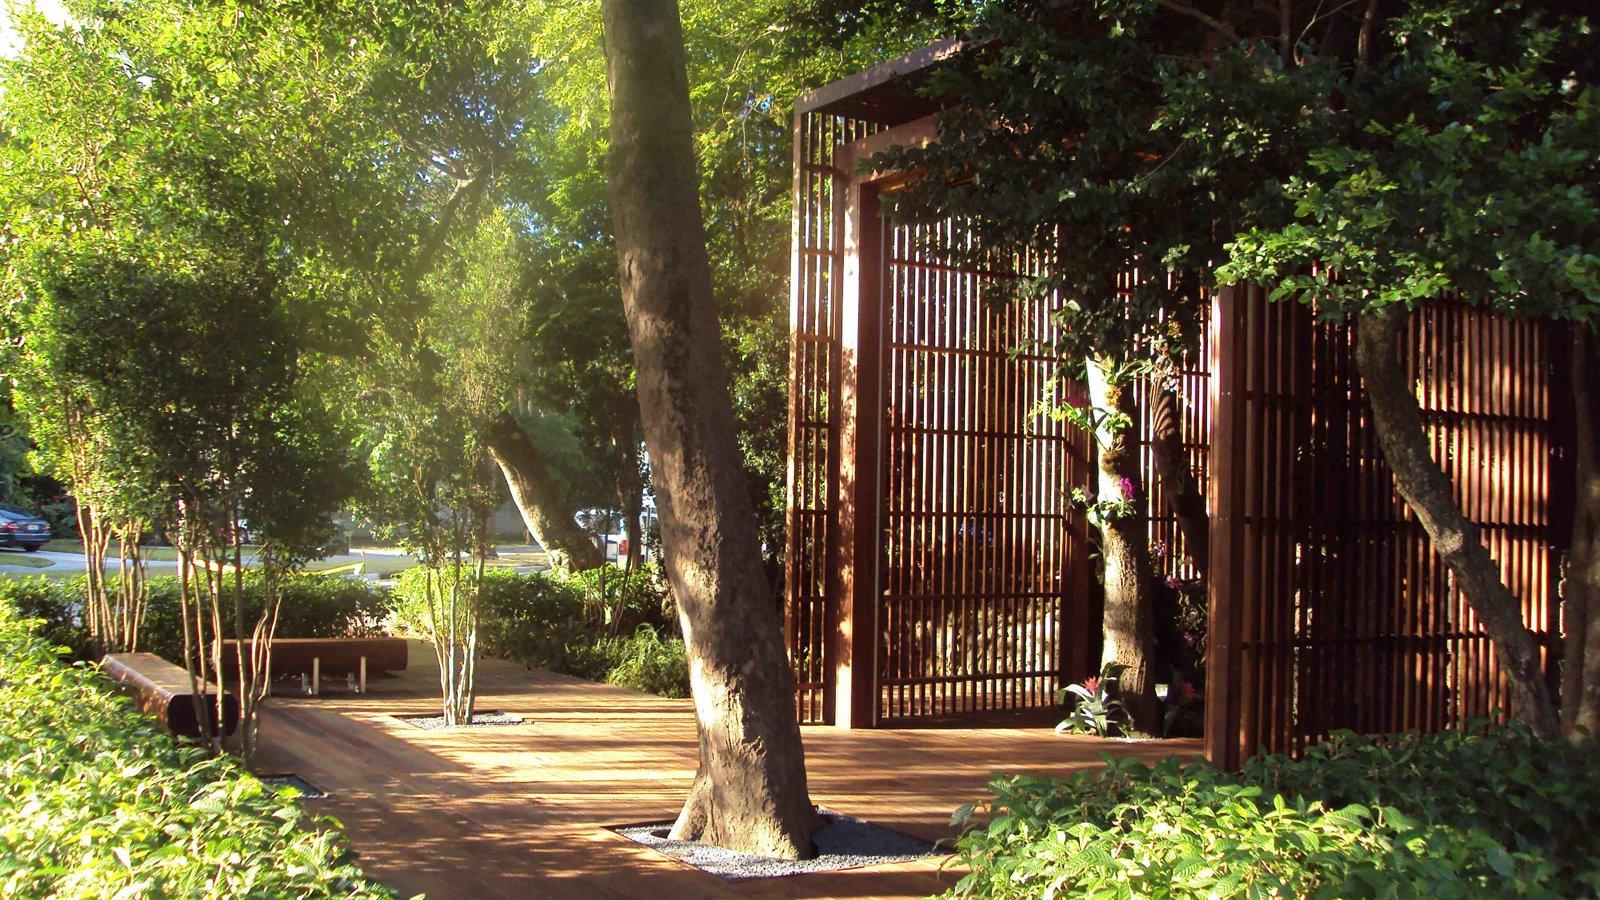 Miami Simpson Park Hammock Dwell